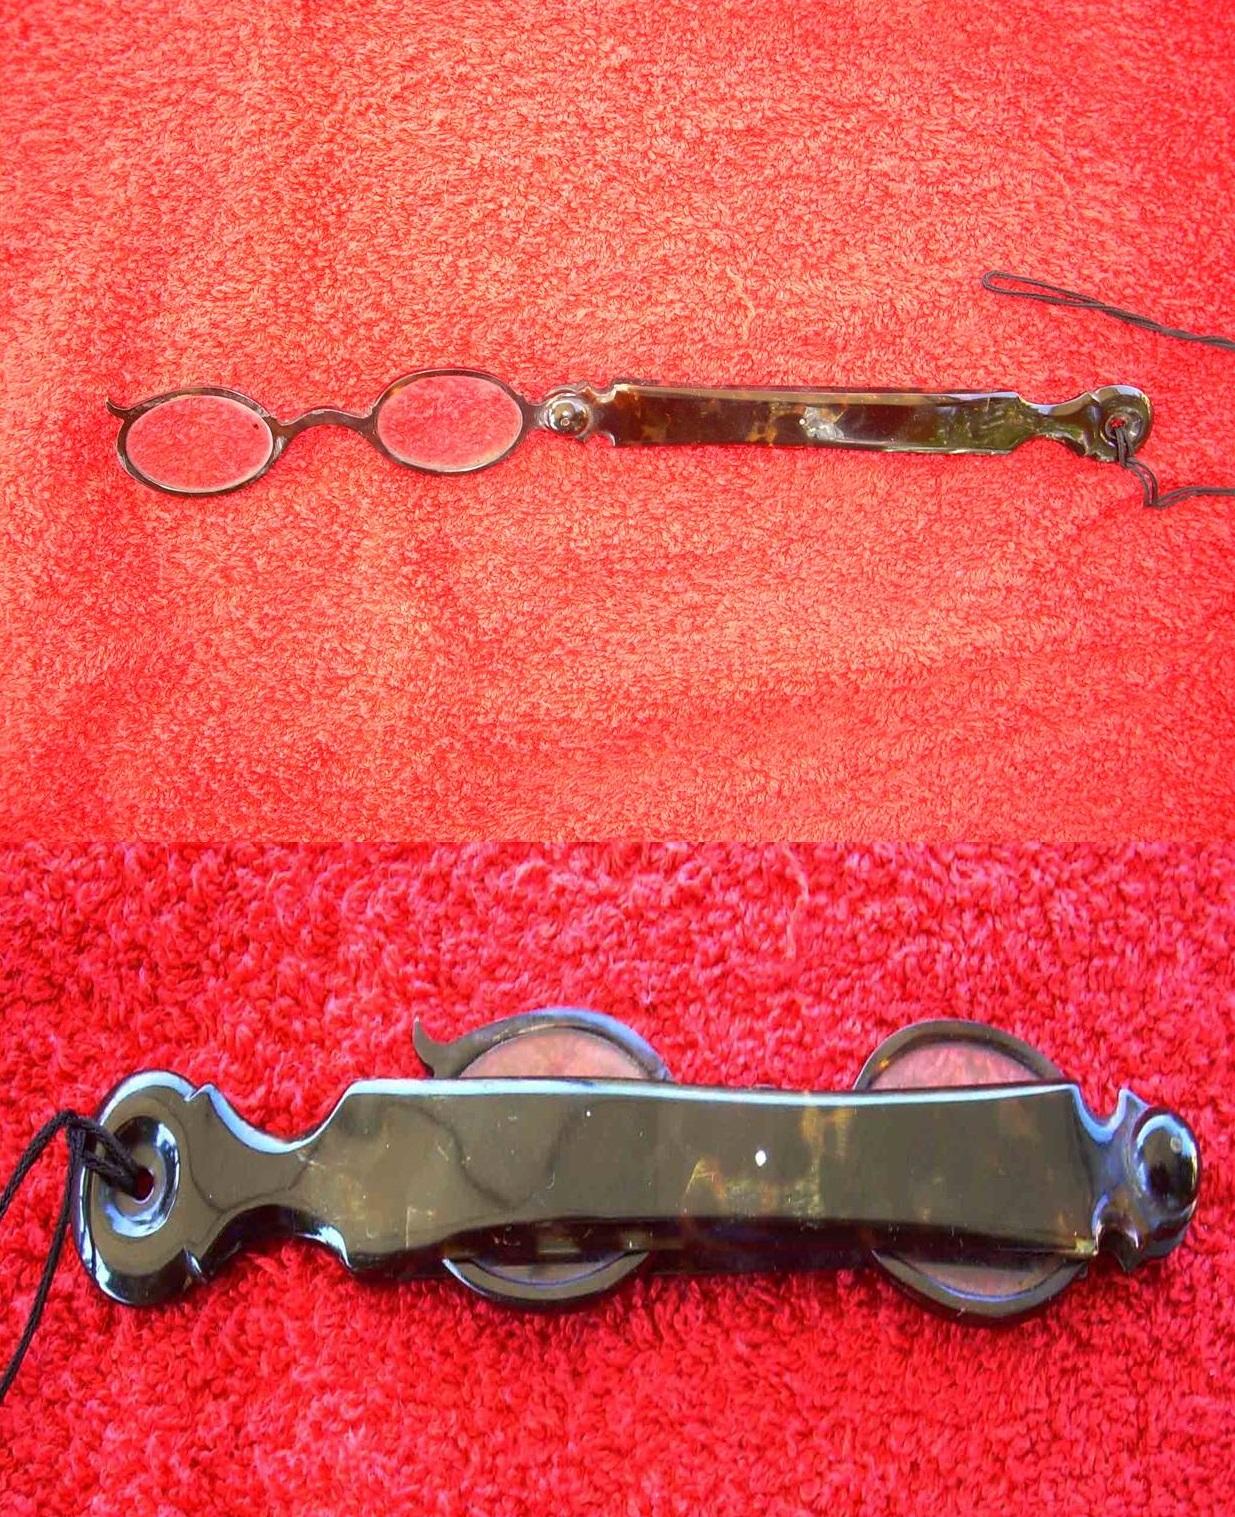 occhialini bachelite_rextauro.info